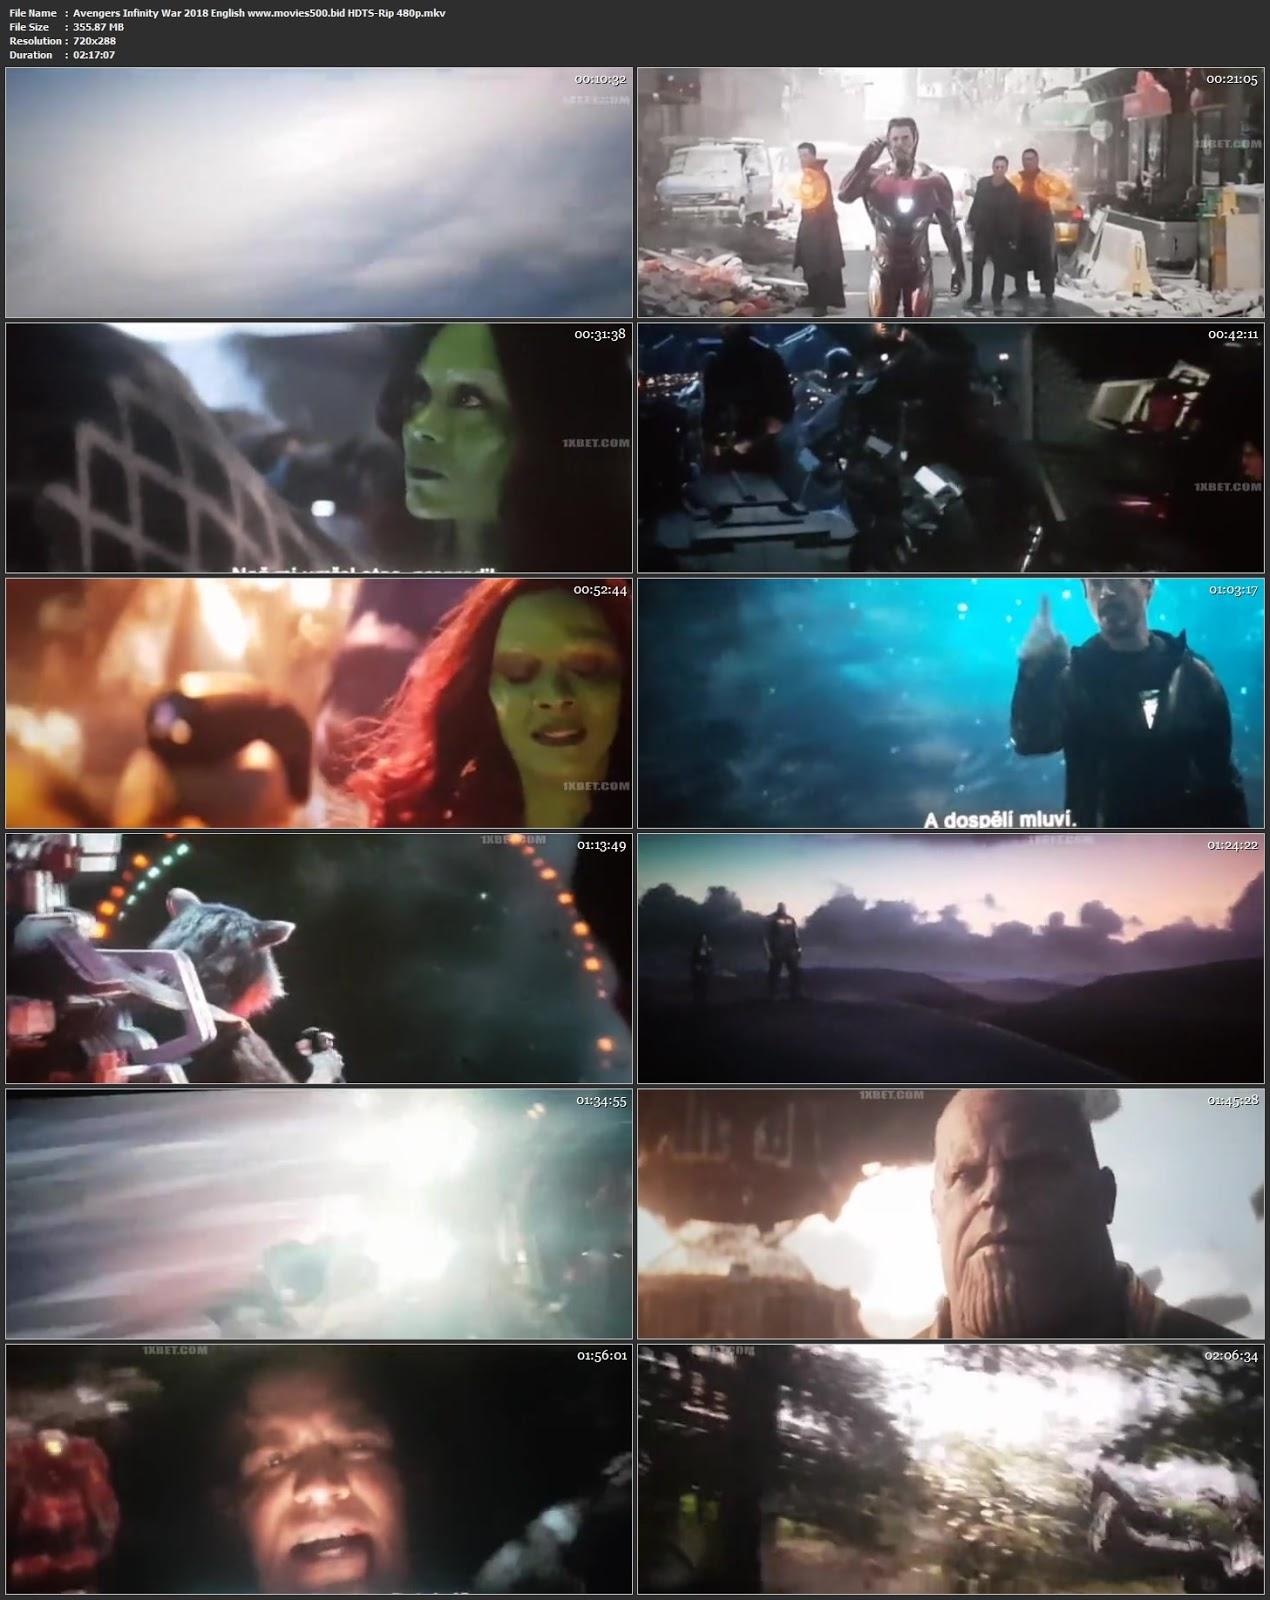 Avengers Infinity War 2018 Hollywood 300MB HDTSRip 480p at tokenguy.com